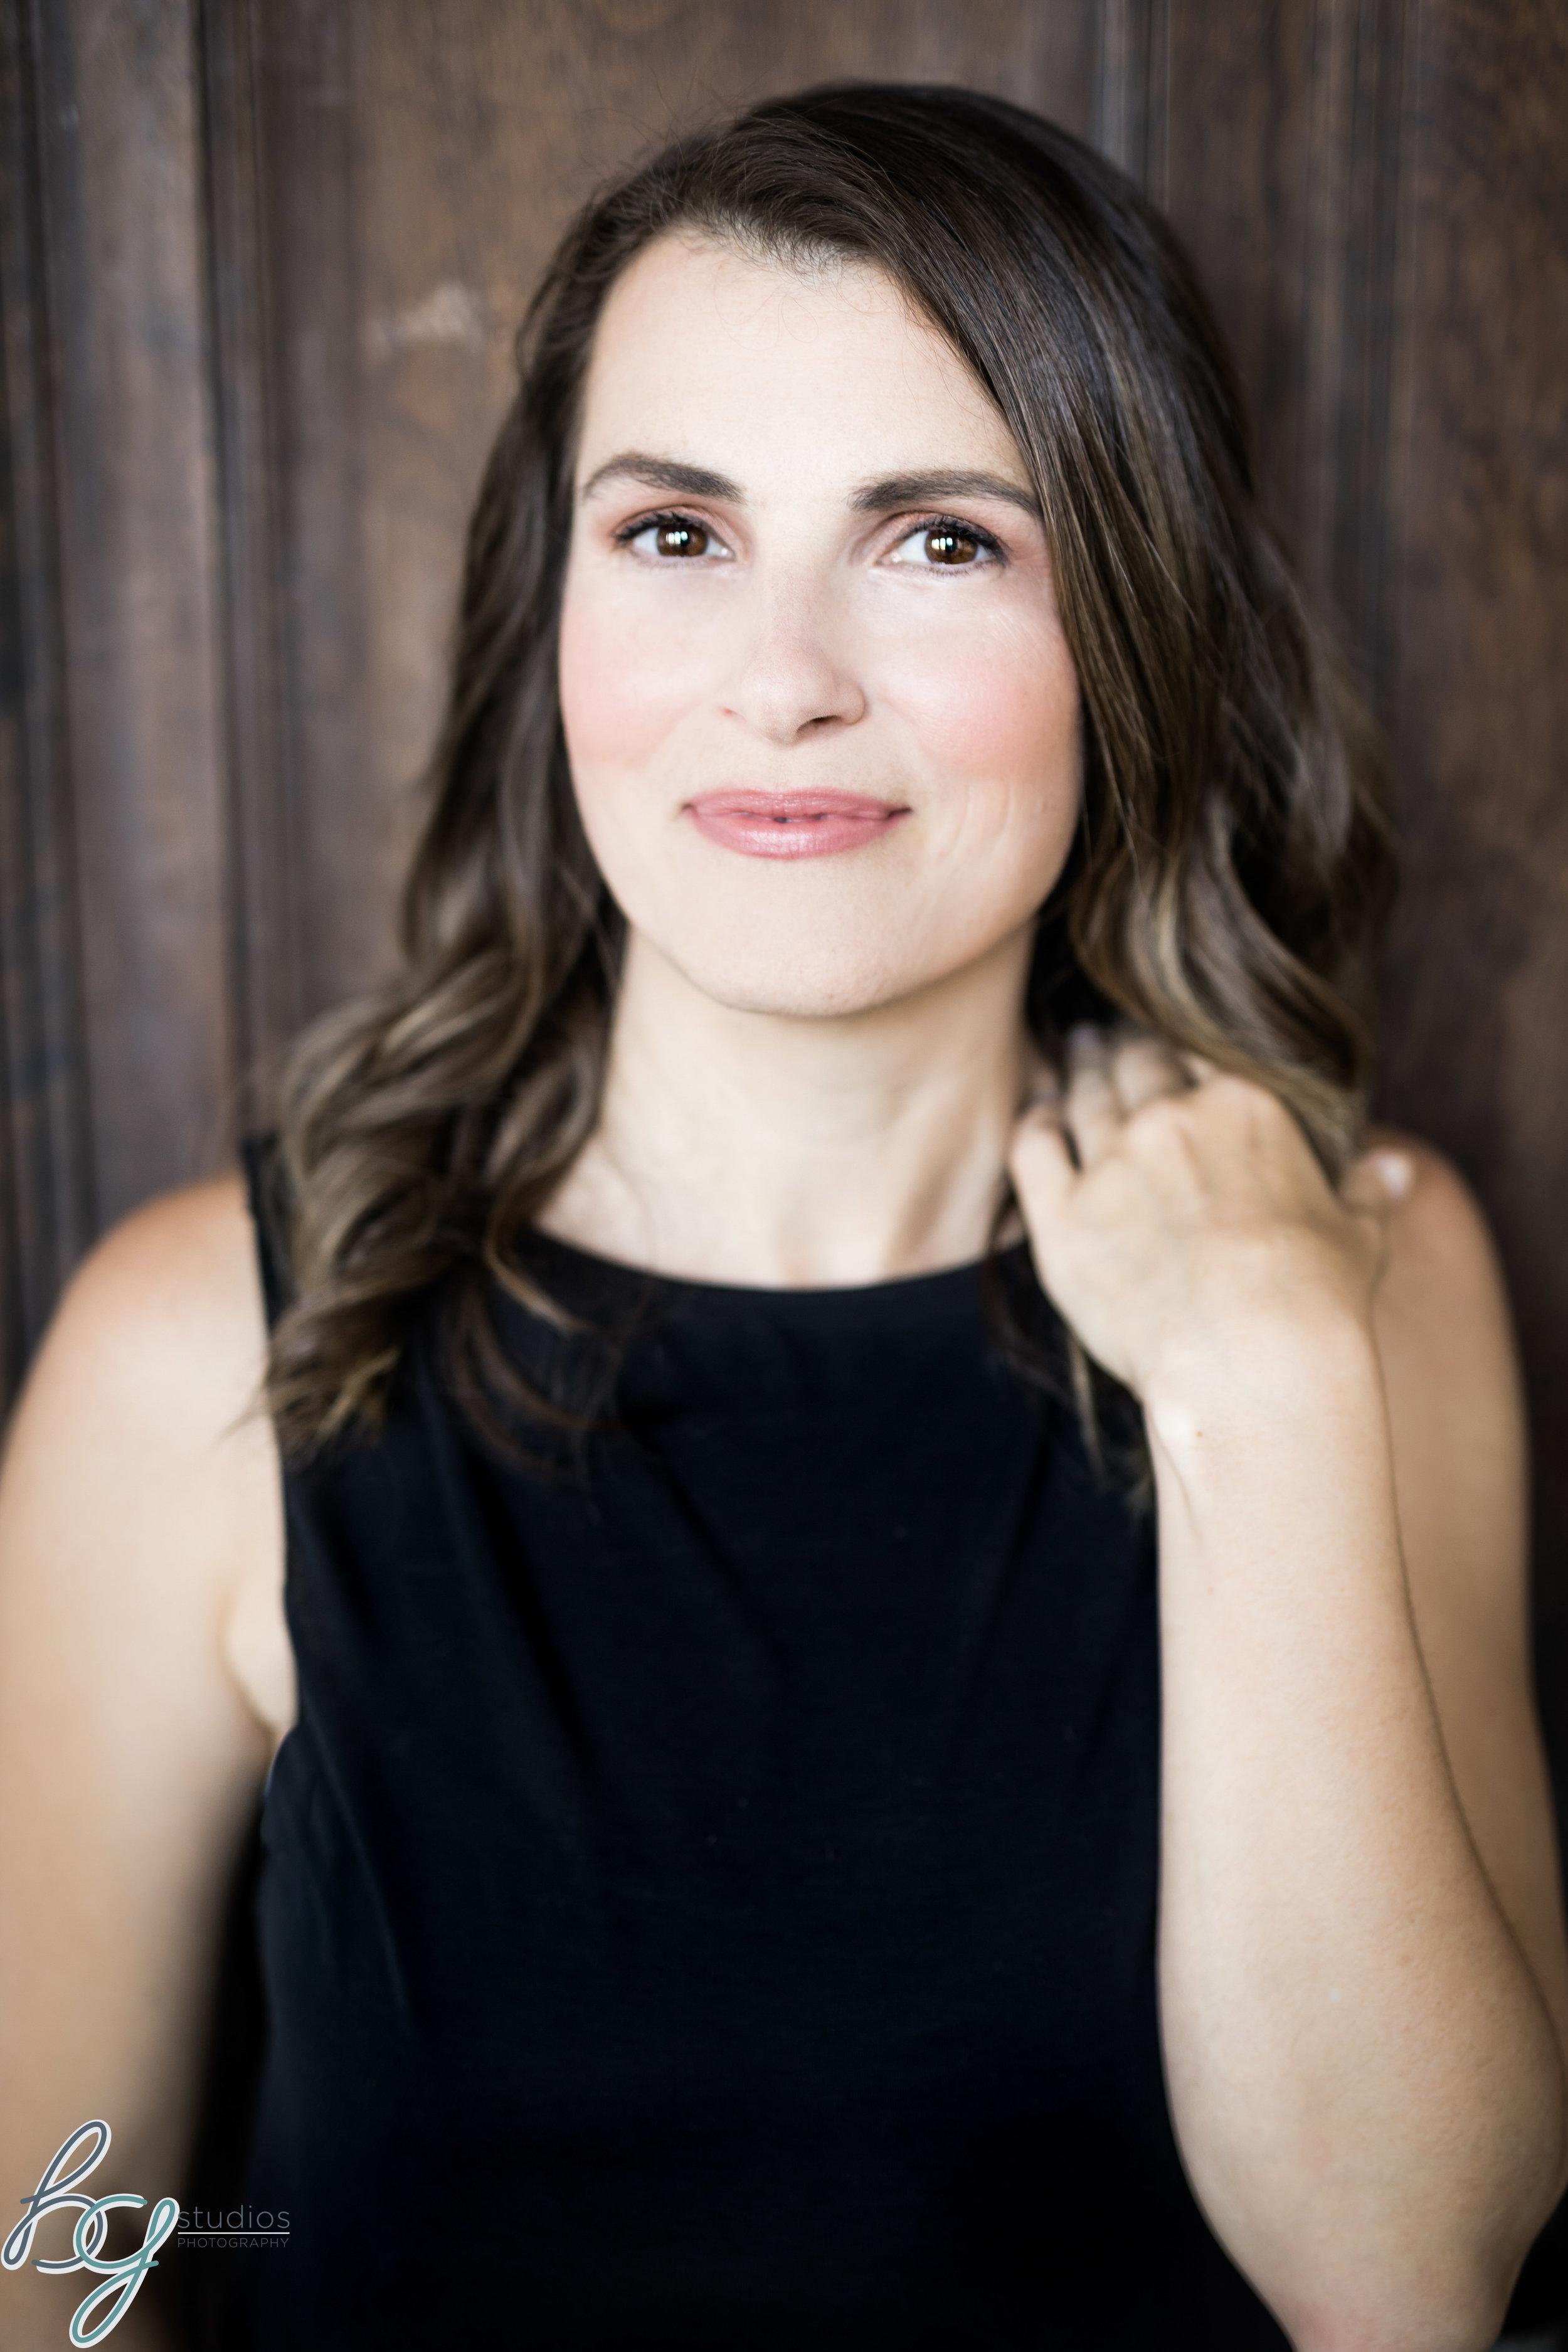 Photo: Brandi Keltner, BGstudios Photography Makeup and hair: Emily Edgar, Emily Edgar Makeup